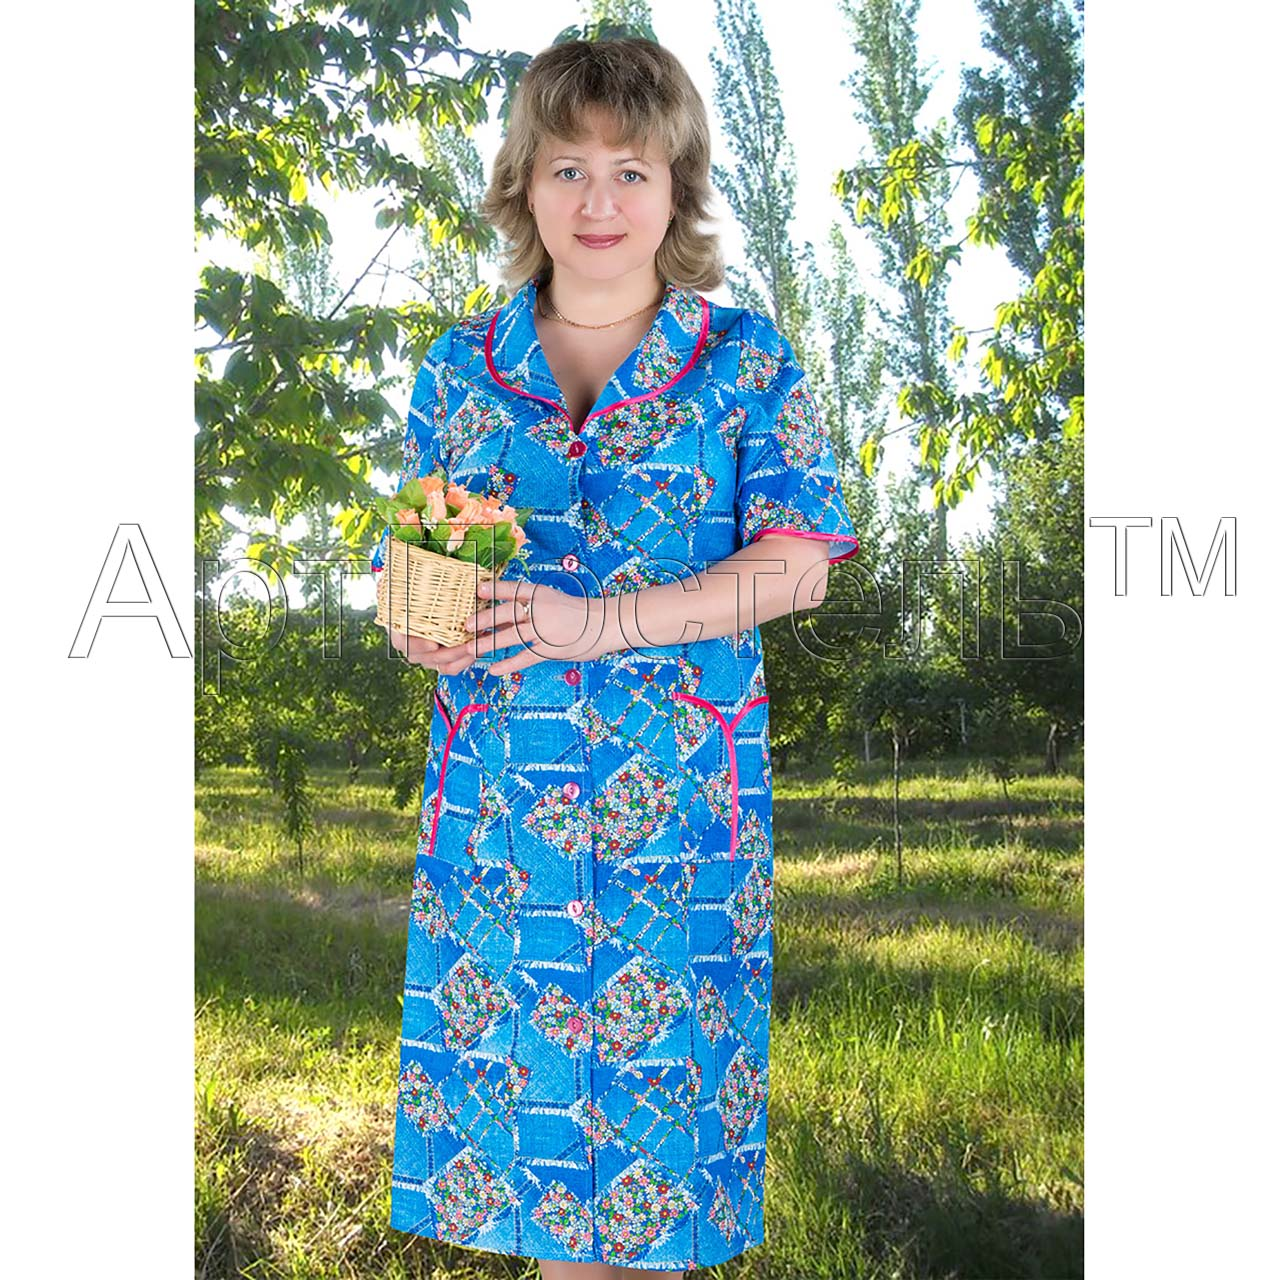 Женский халат Американка на пуговицах, размер 46Халаты<br>Обхват груди:92 см<br>Обхват талии:73 см<br>Обхват бедер:100 см<br>Рост:164-170 см<br><br>Тип: Жен. халат<br>Размер: 46<br>Материал: Бязь